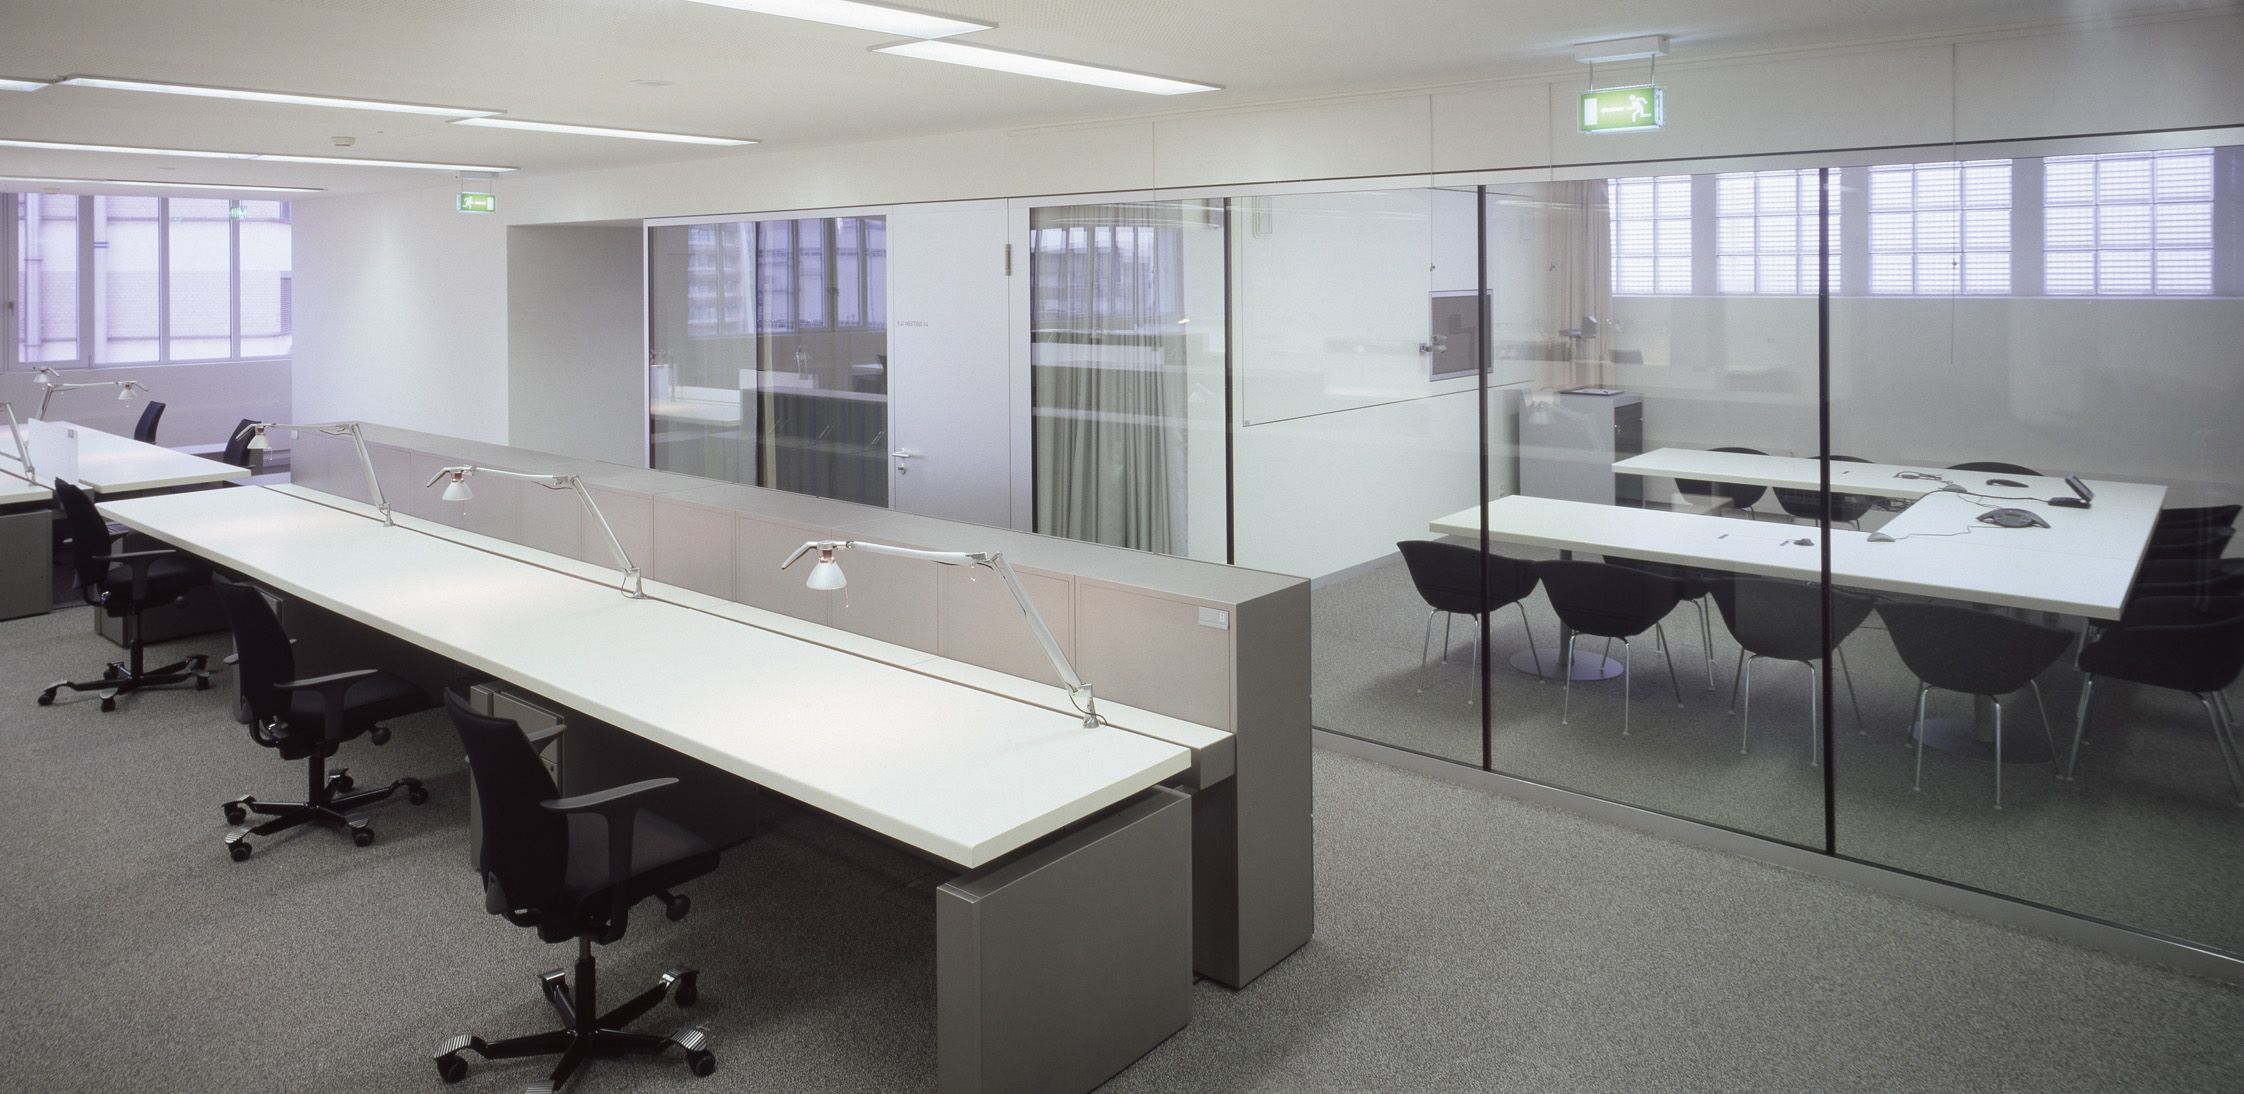 #Norvartis #Basilea #Unifor #Unifurniture #design